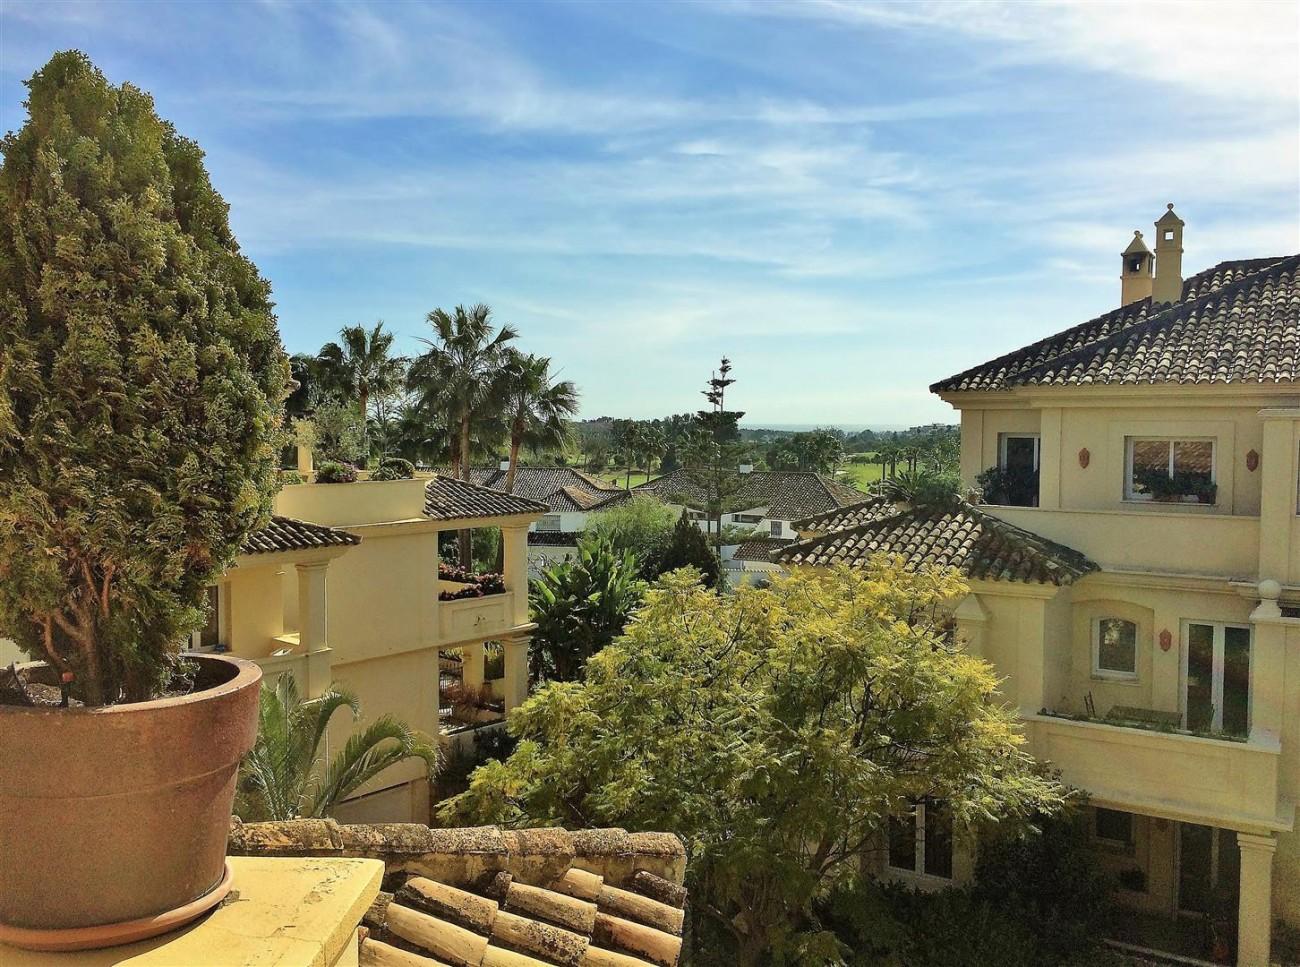 Penthouse for sale Las Alamandas Nueva Andalucia Marbella Spain (18) (Large)